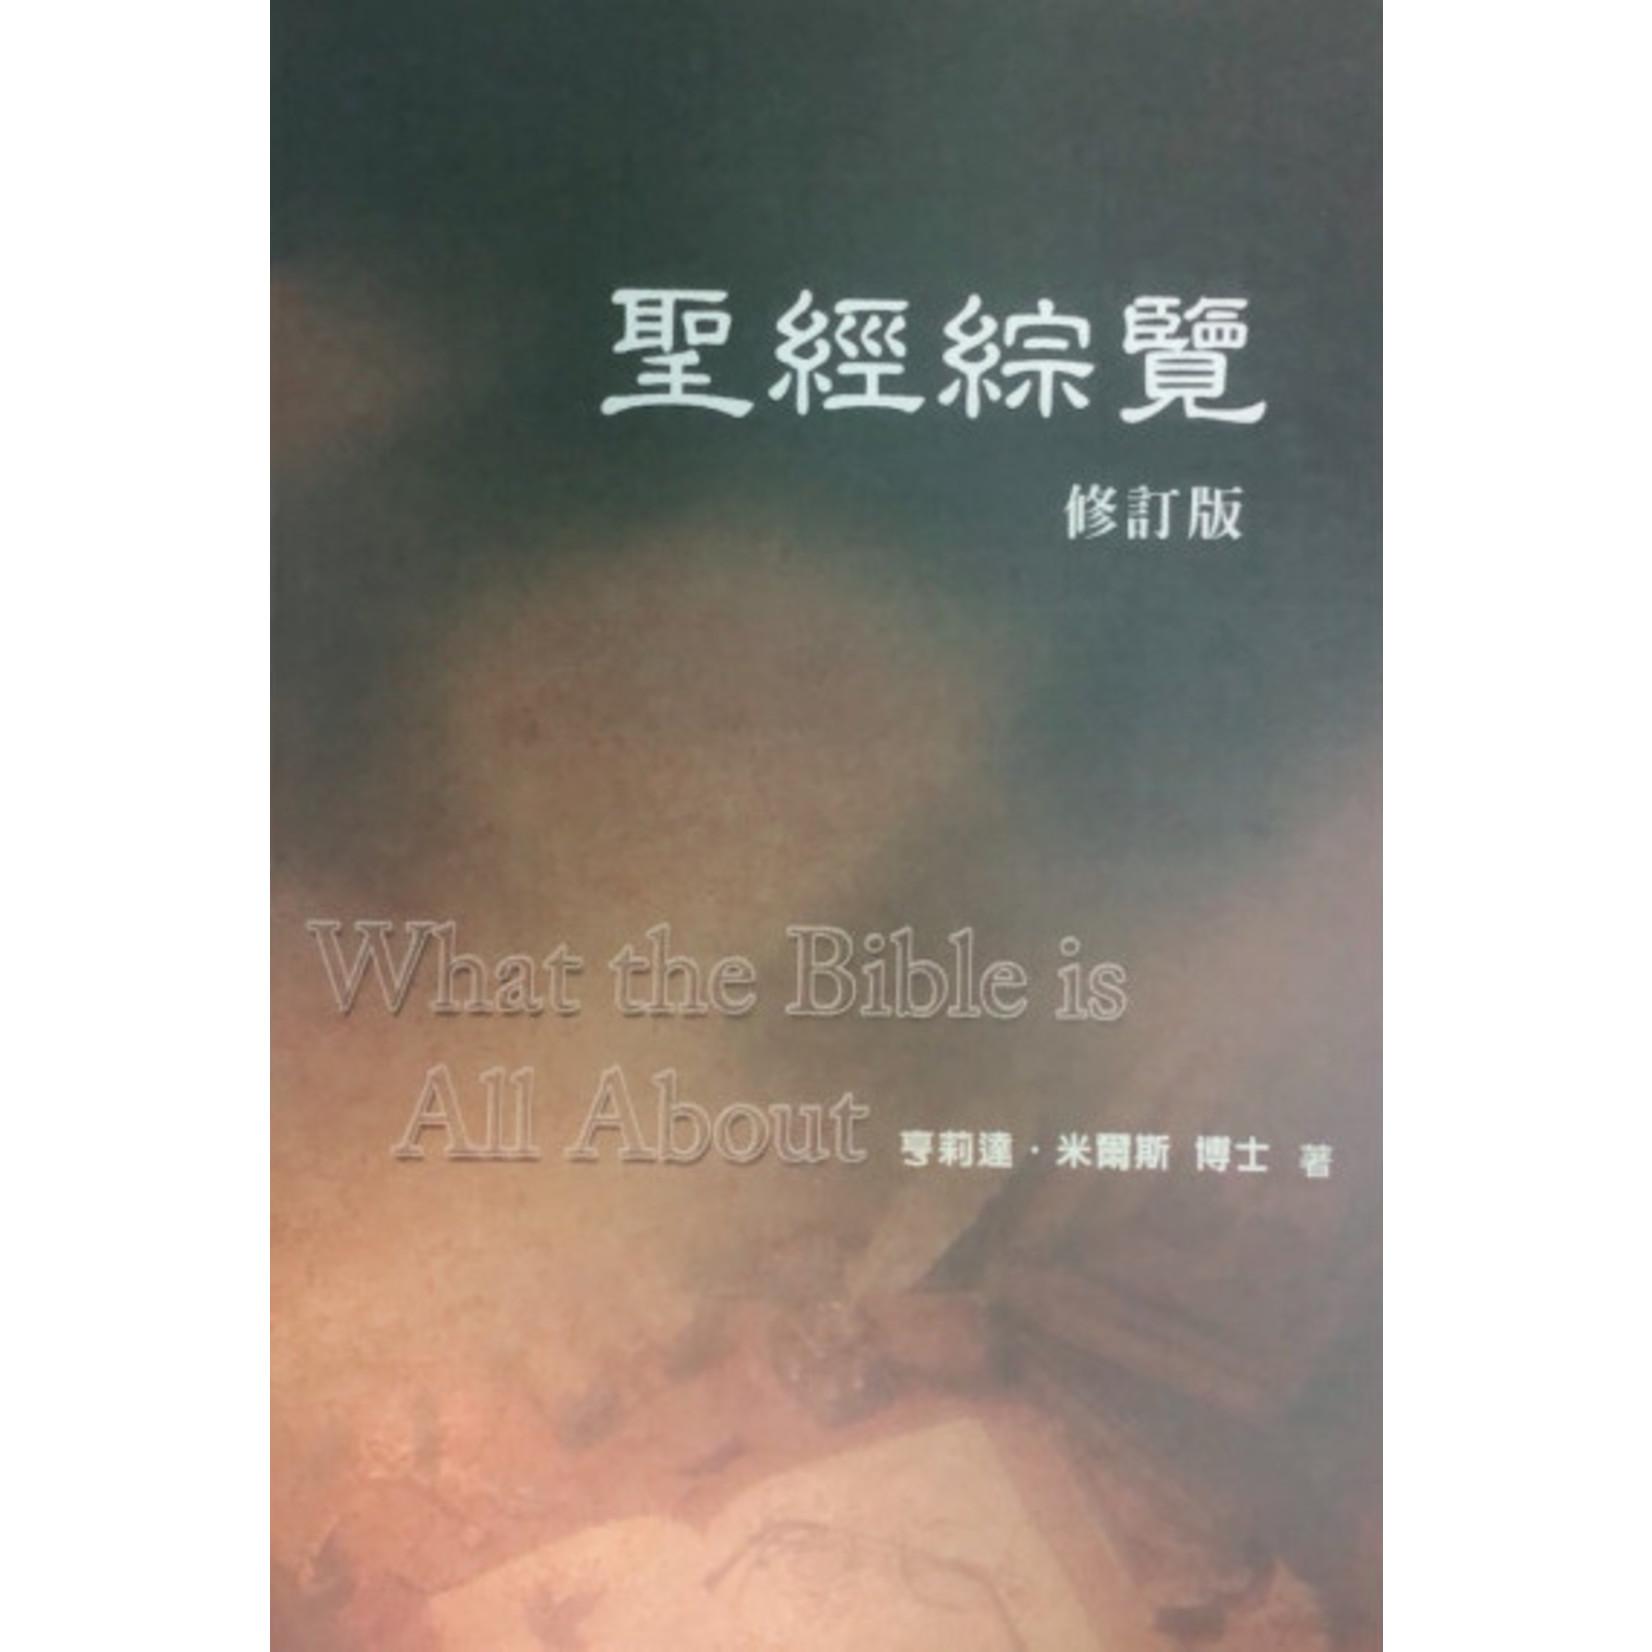 中國主日學協會 China Sunday School Association 聖經綜覽(修訂版) What the Bible is All About